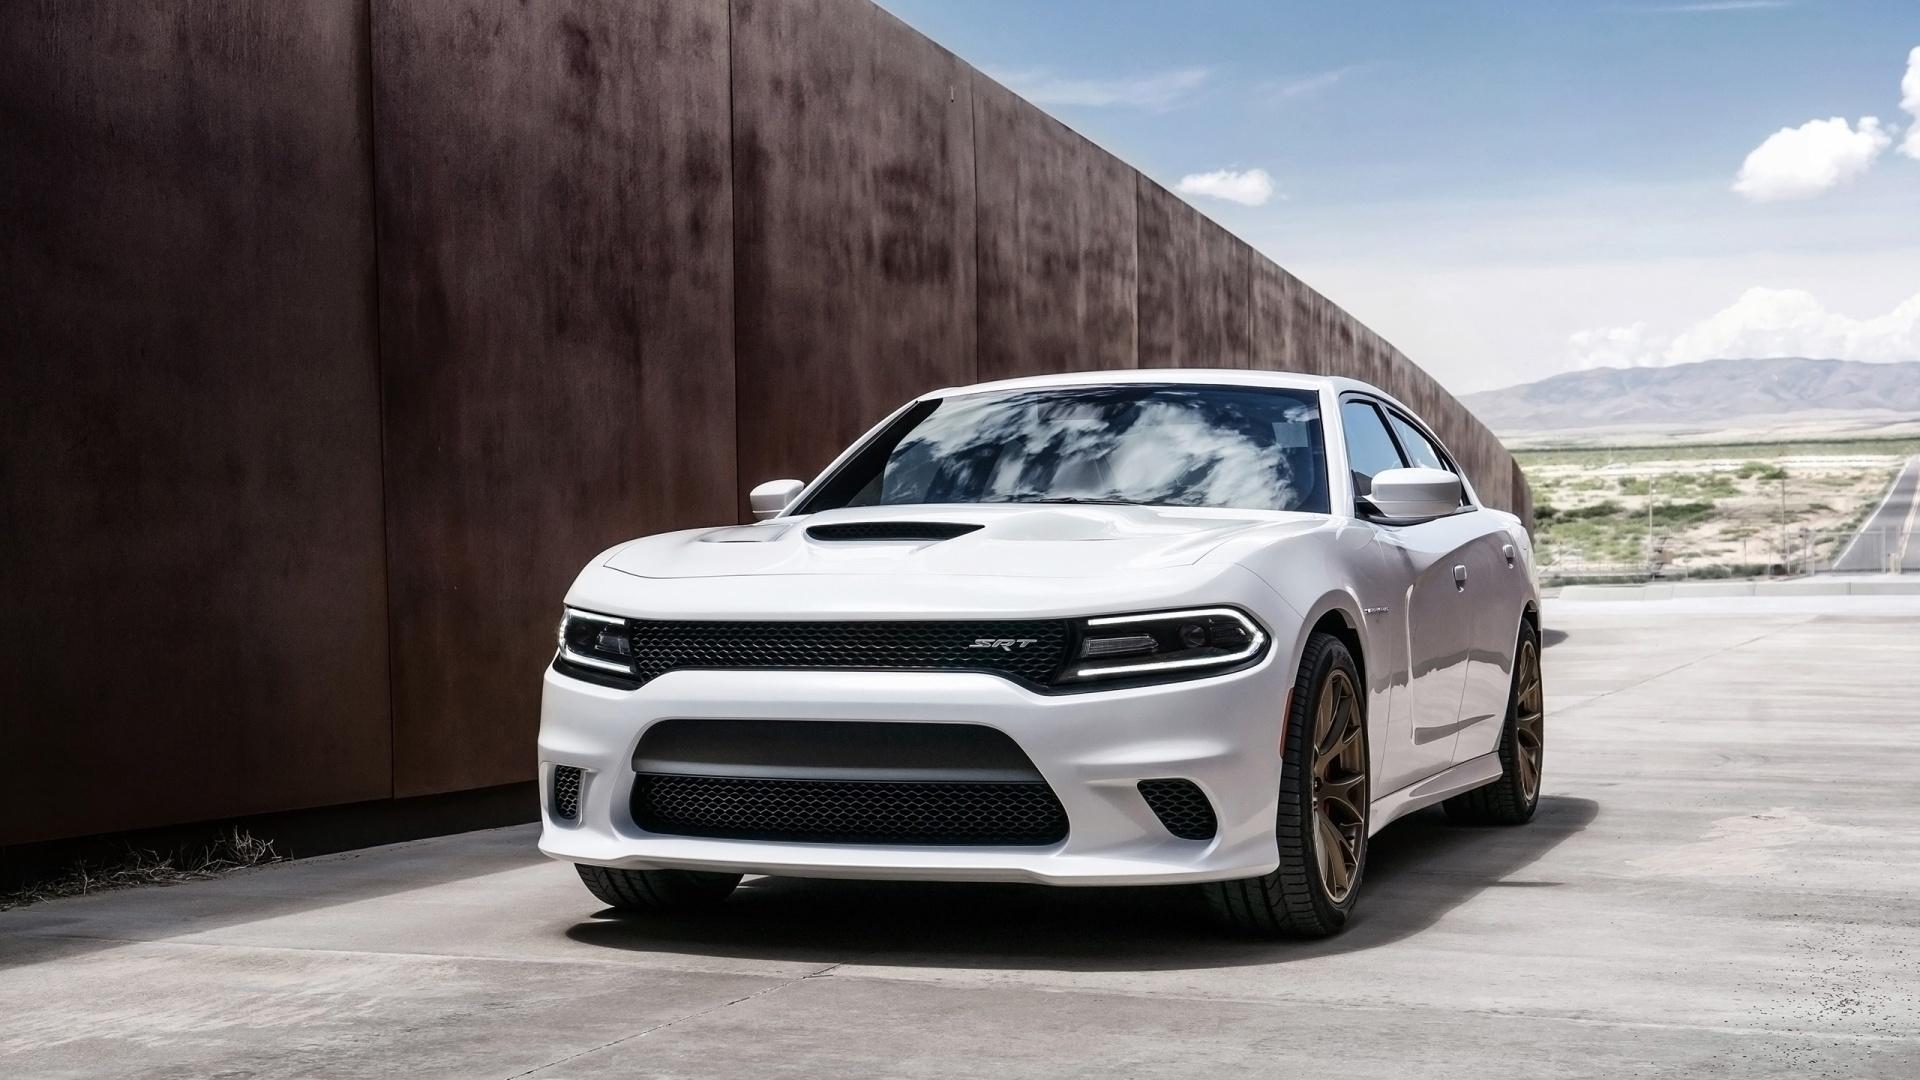 2015 Dodge Charger SRT Hellcat 3 Wallpaper HD Car Wallpapers 1920x1080